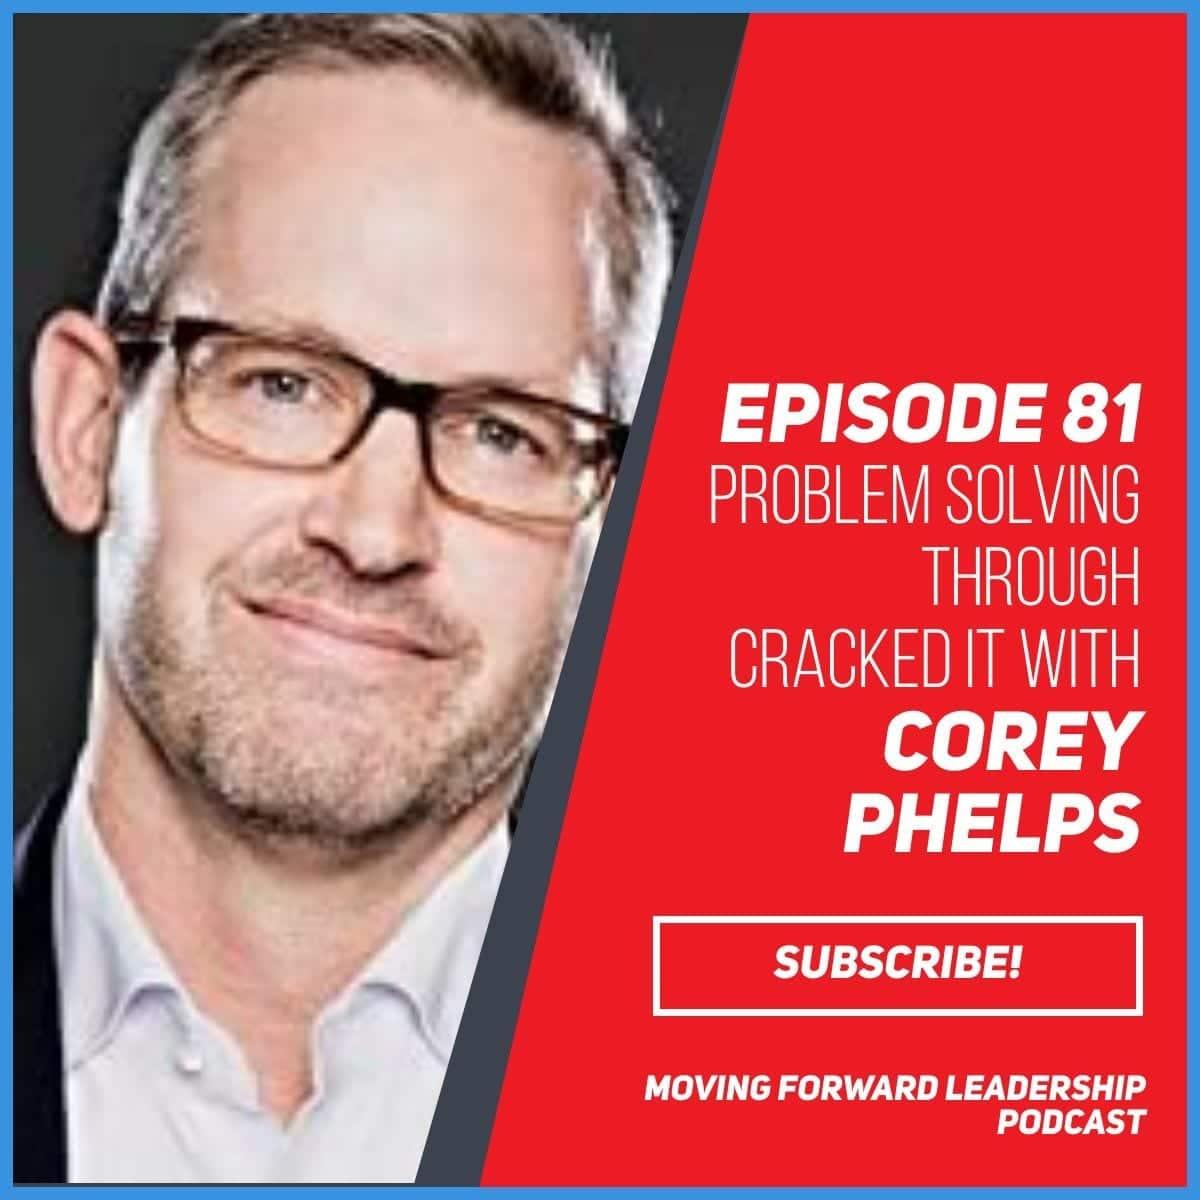 Problem Solving Through CrackedIt | Corey Phelps | Episode 81